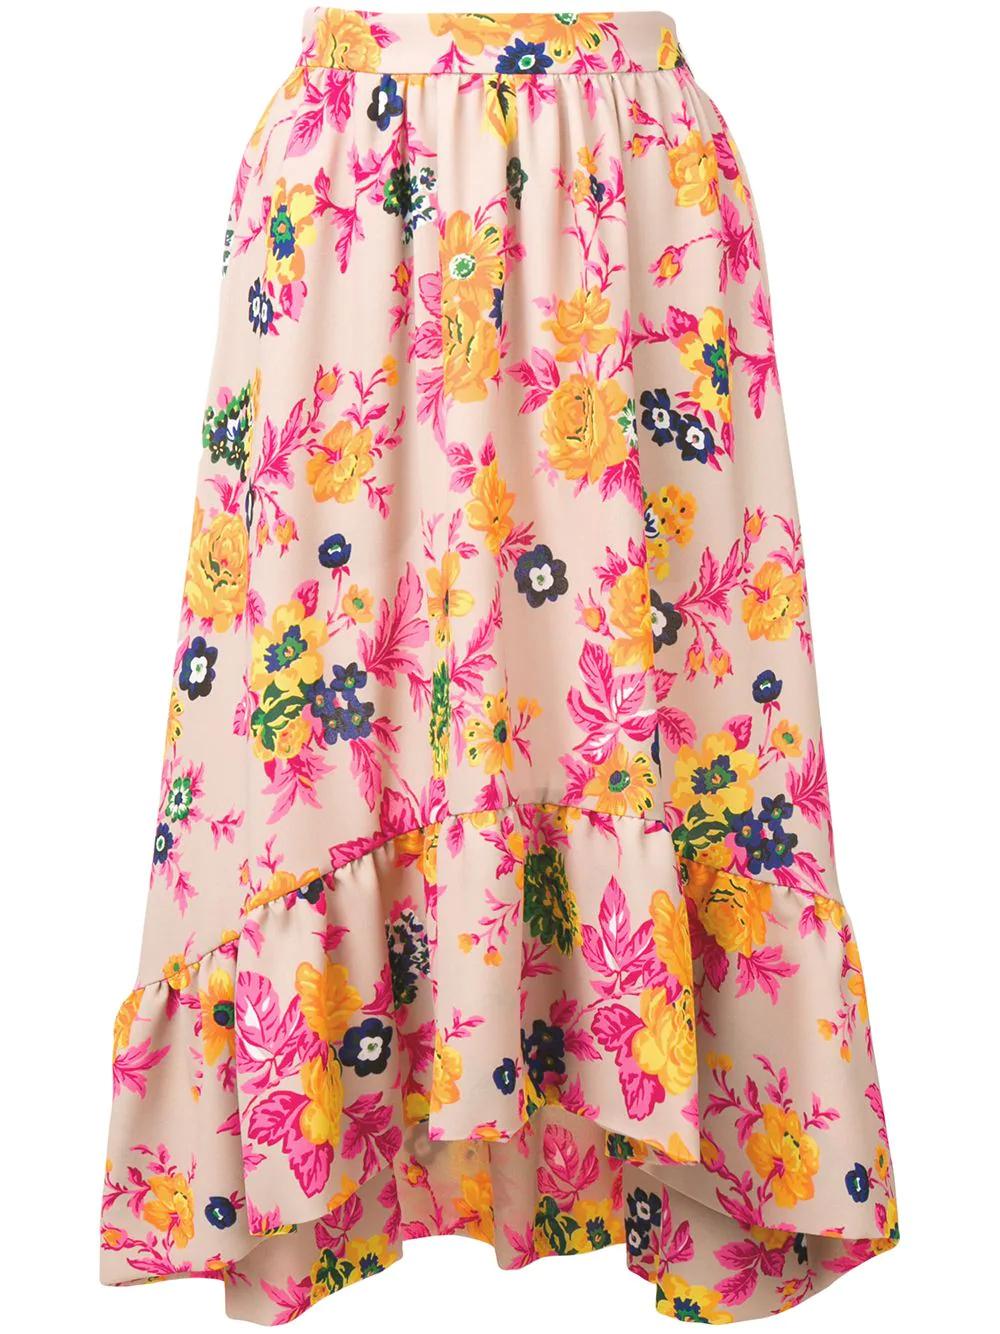 MSGM | асимметричная юбка с цветочным принтом | Clouty